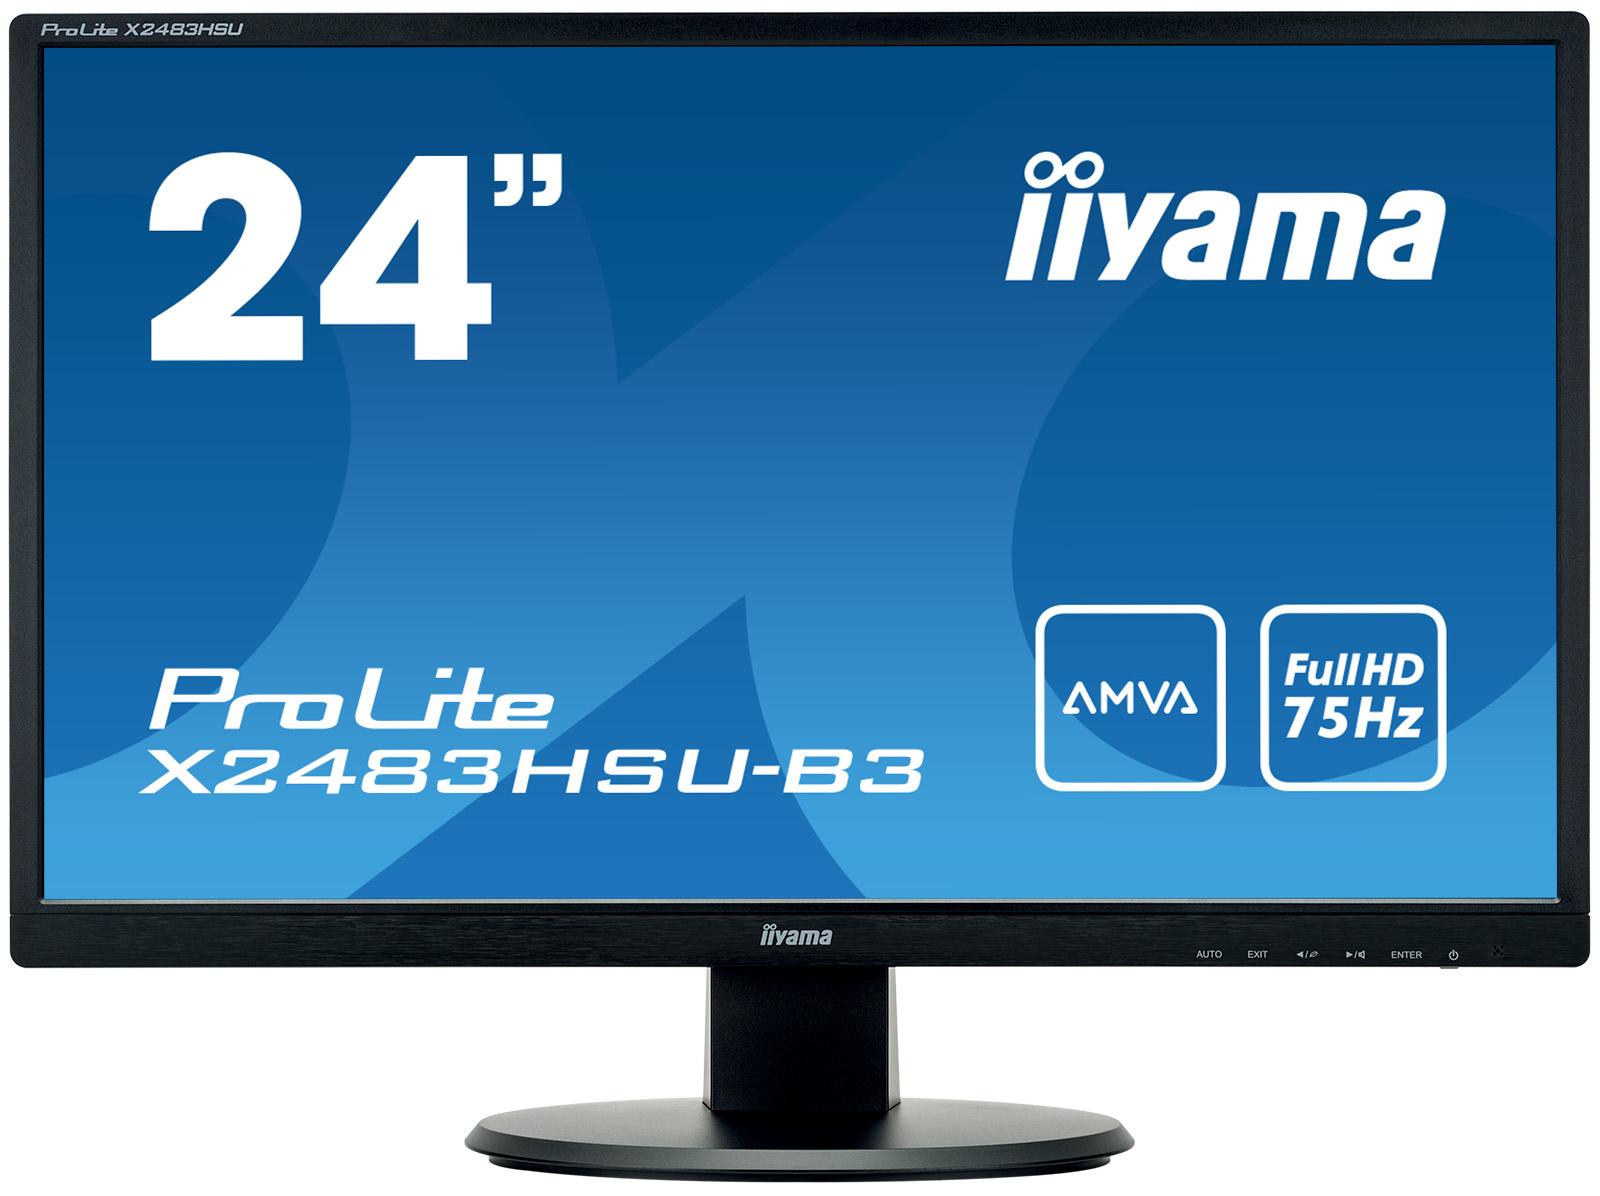 "iiyama ProLite X2483HSU-B3 23.8"" Full HD LED Matt Flat Black computer monitor LED display"